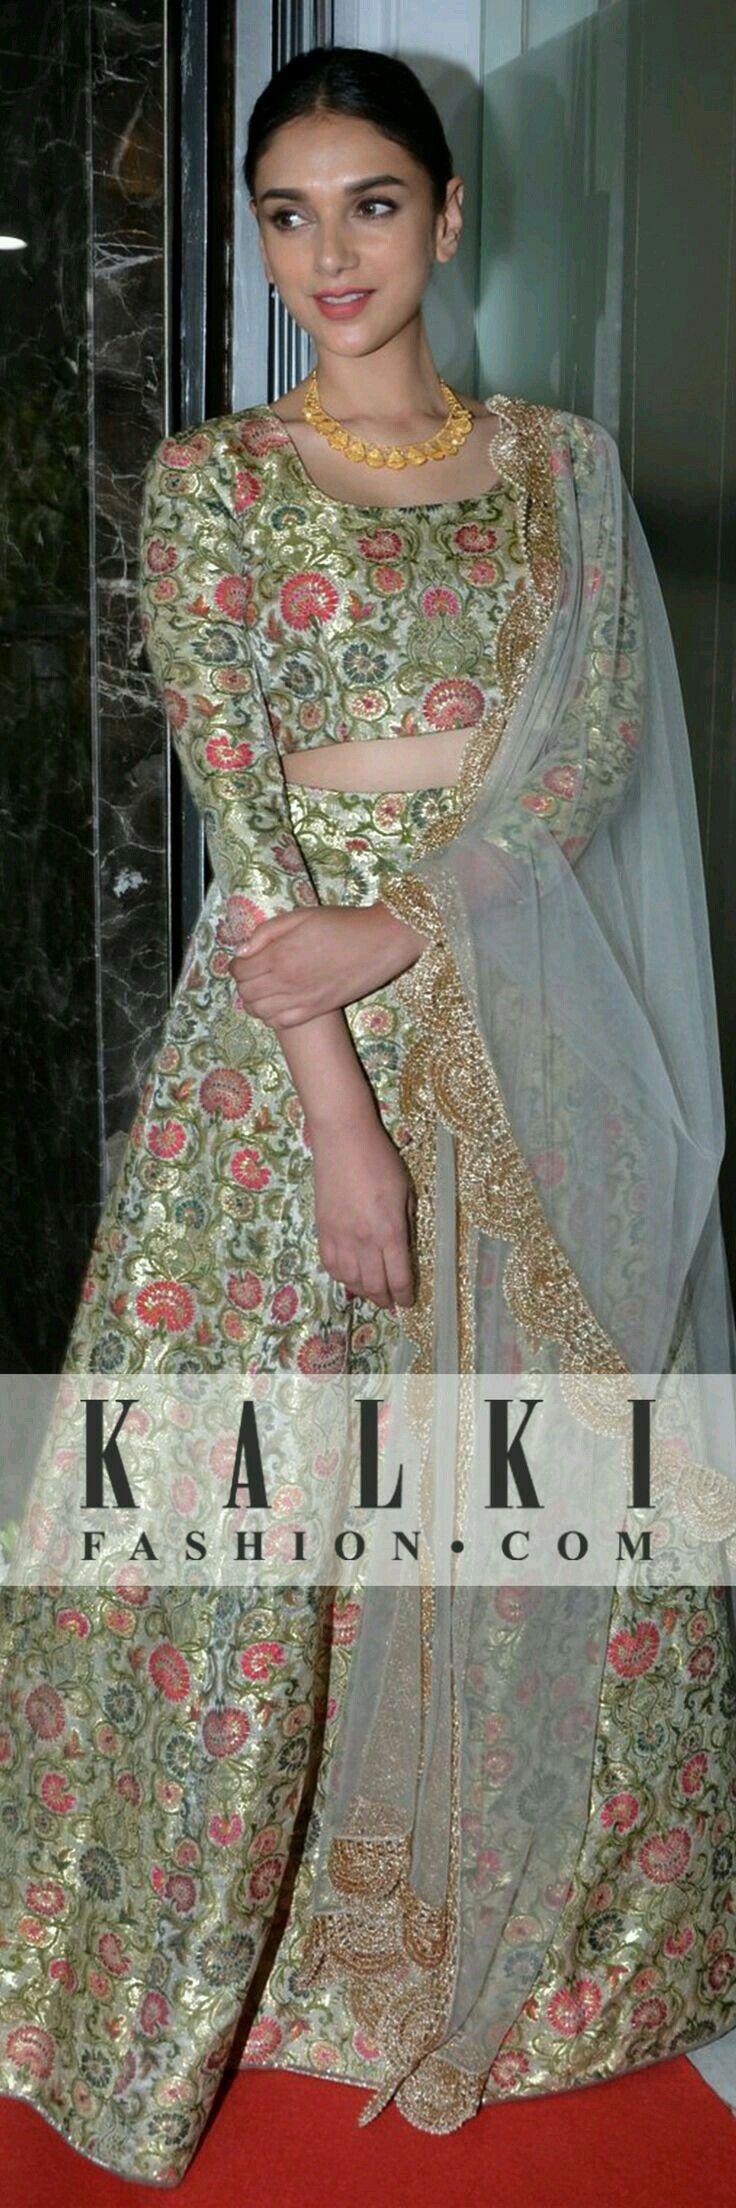 Indian outfit. Aditi rao haidri Pinterest: @reetk516